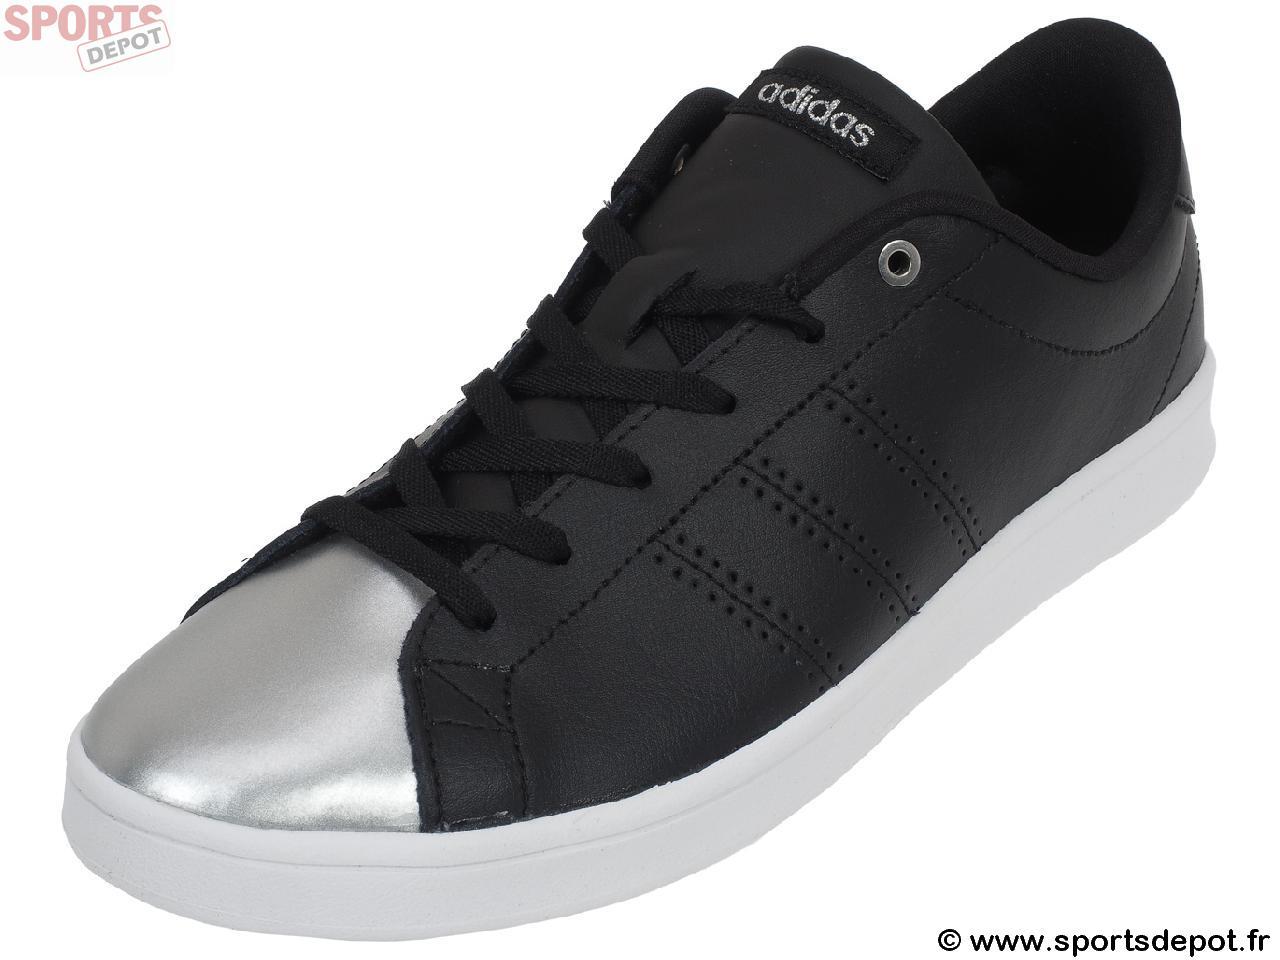 Chaussures mode ville Advantage noir arg - Adidas neo GcnbWYeZg